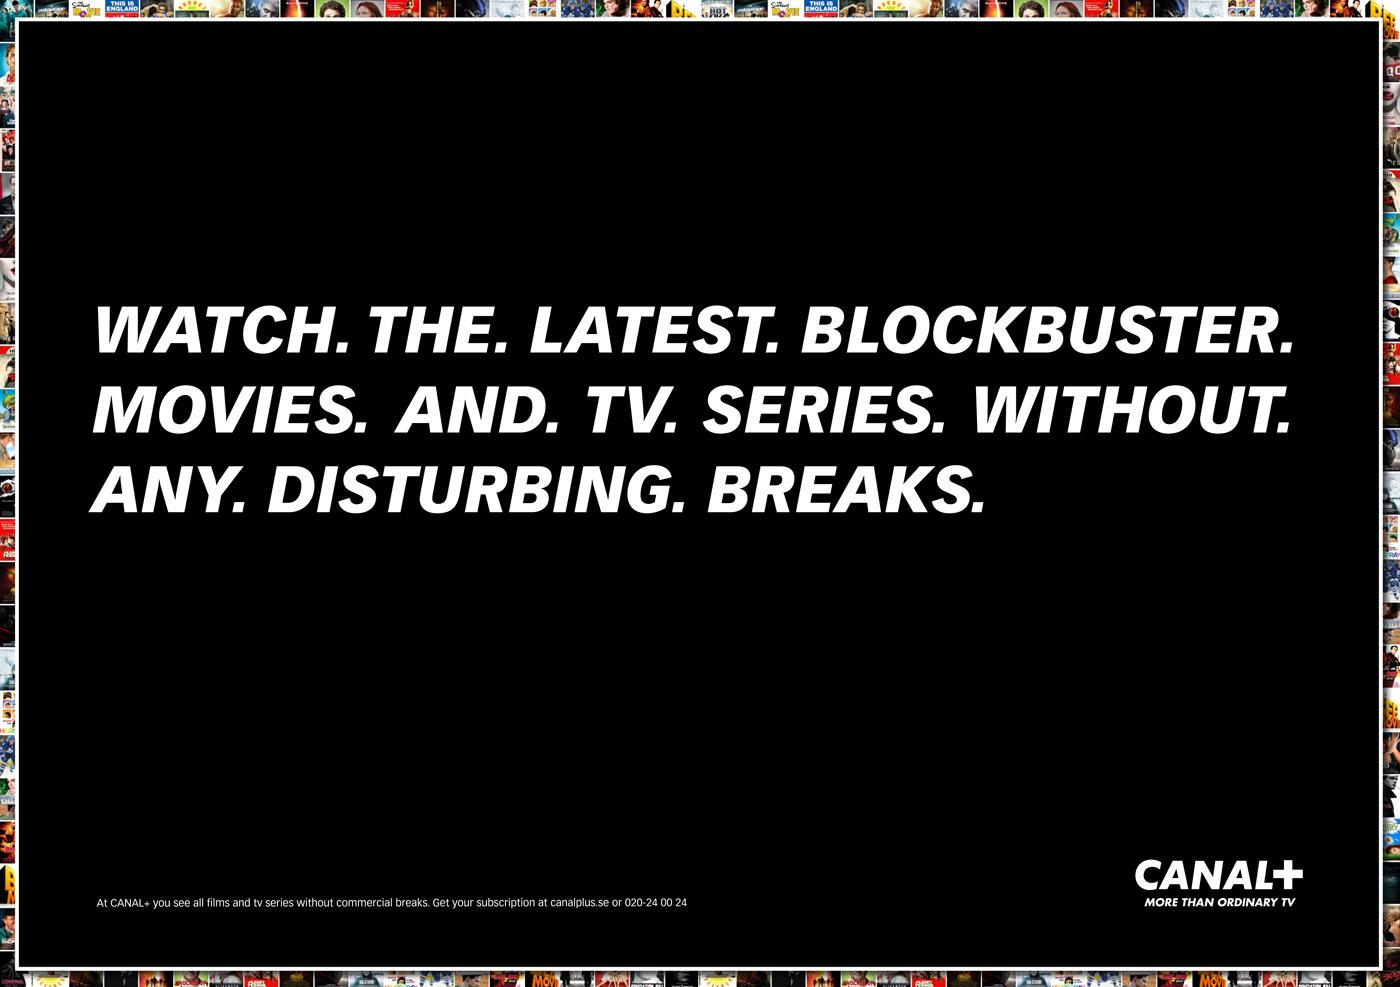 Canal+ Print Ad -  No disturbing breaks, 2